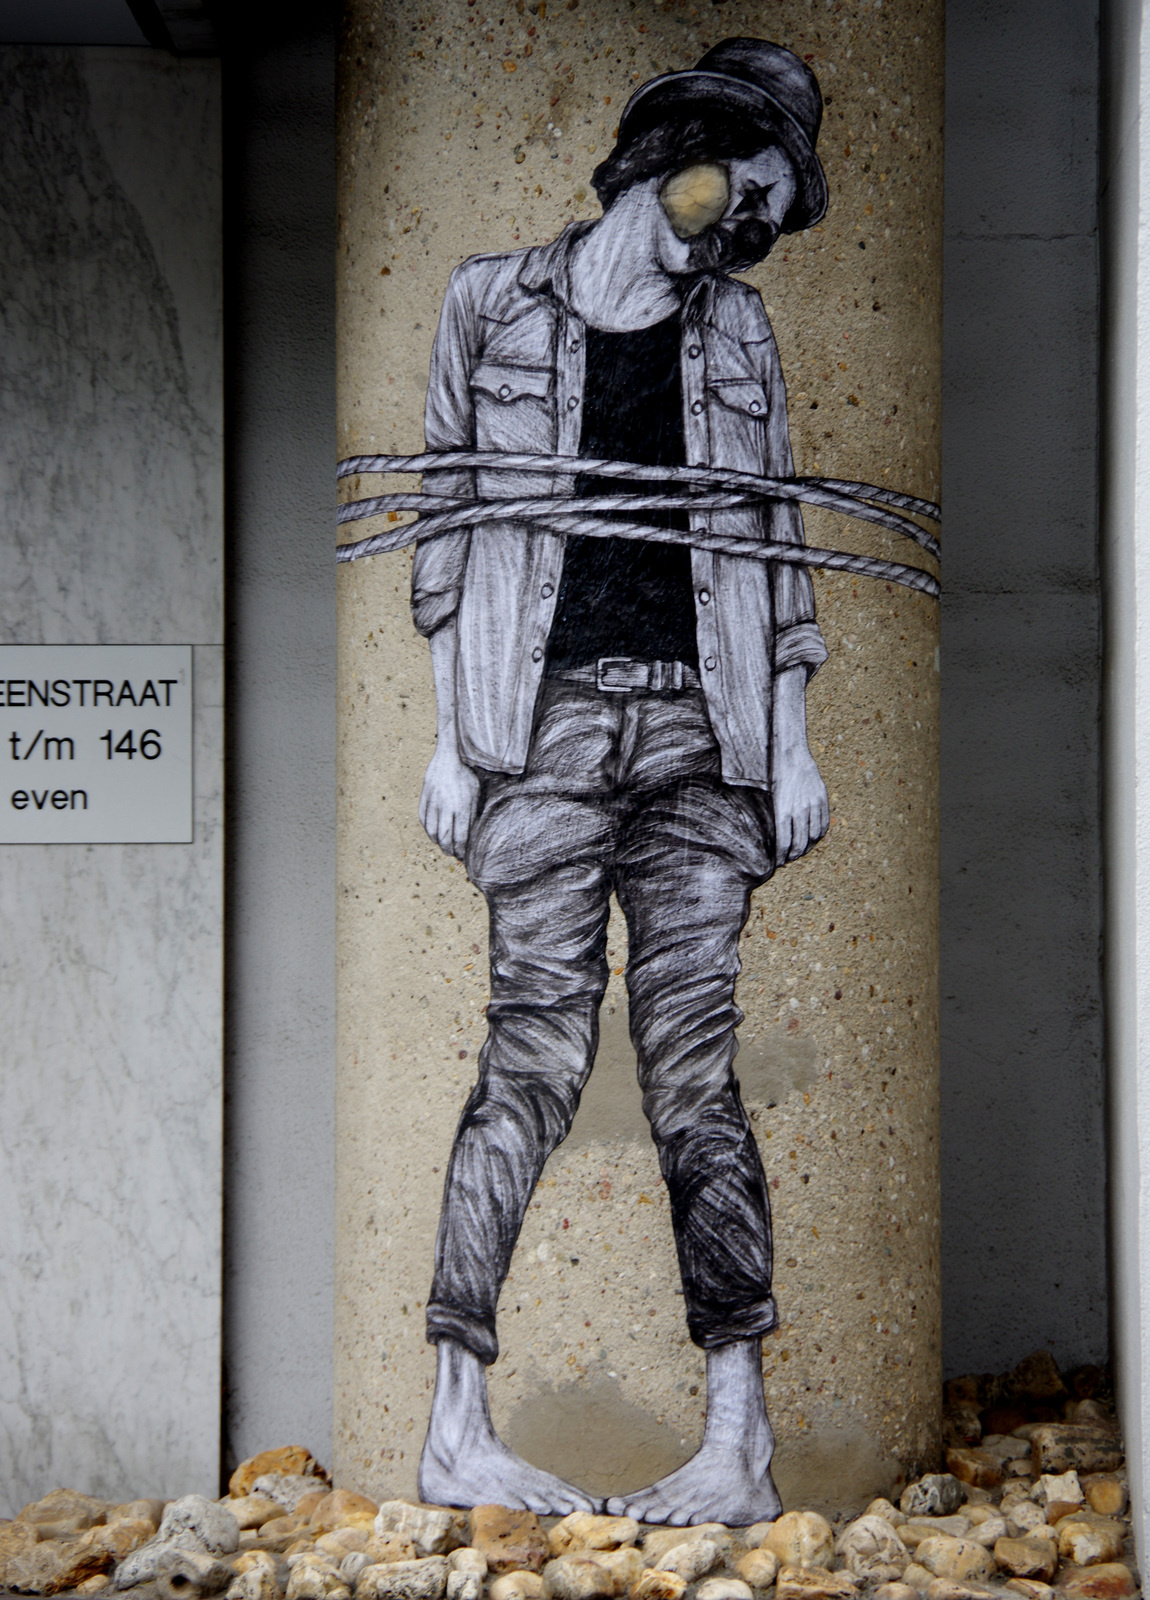 graffiti mujer atada a columna